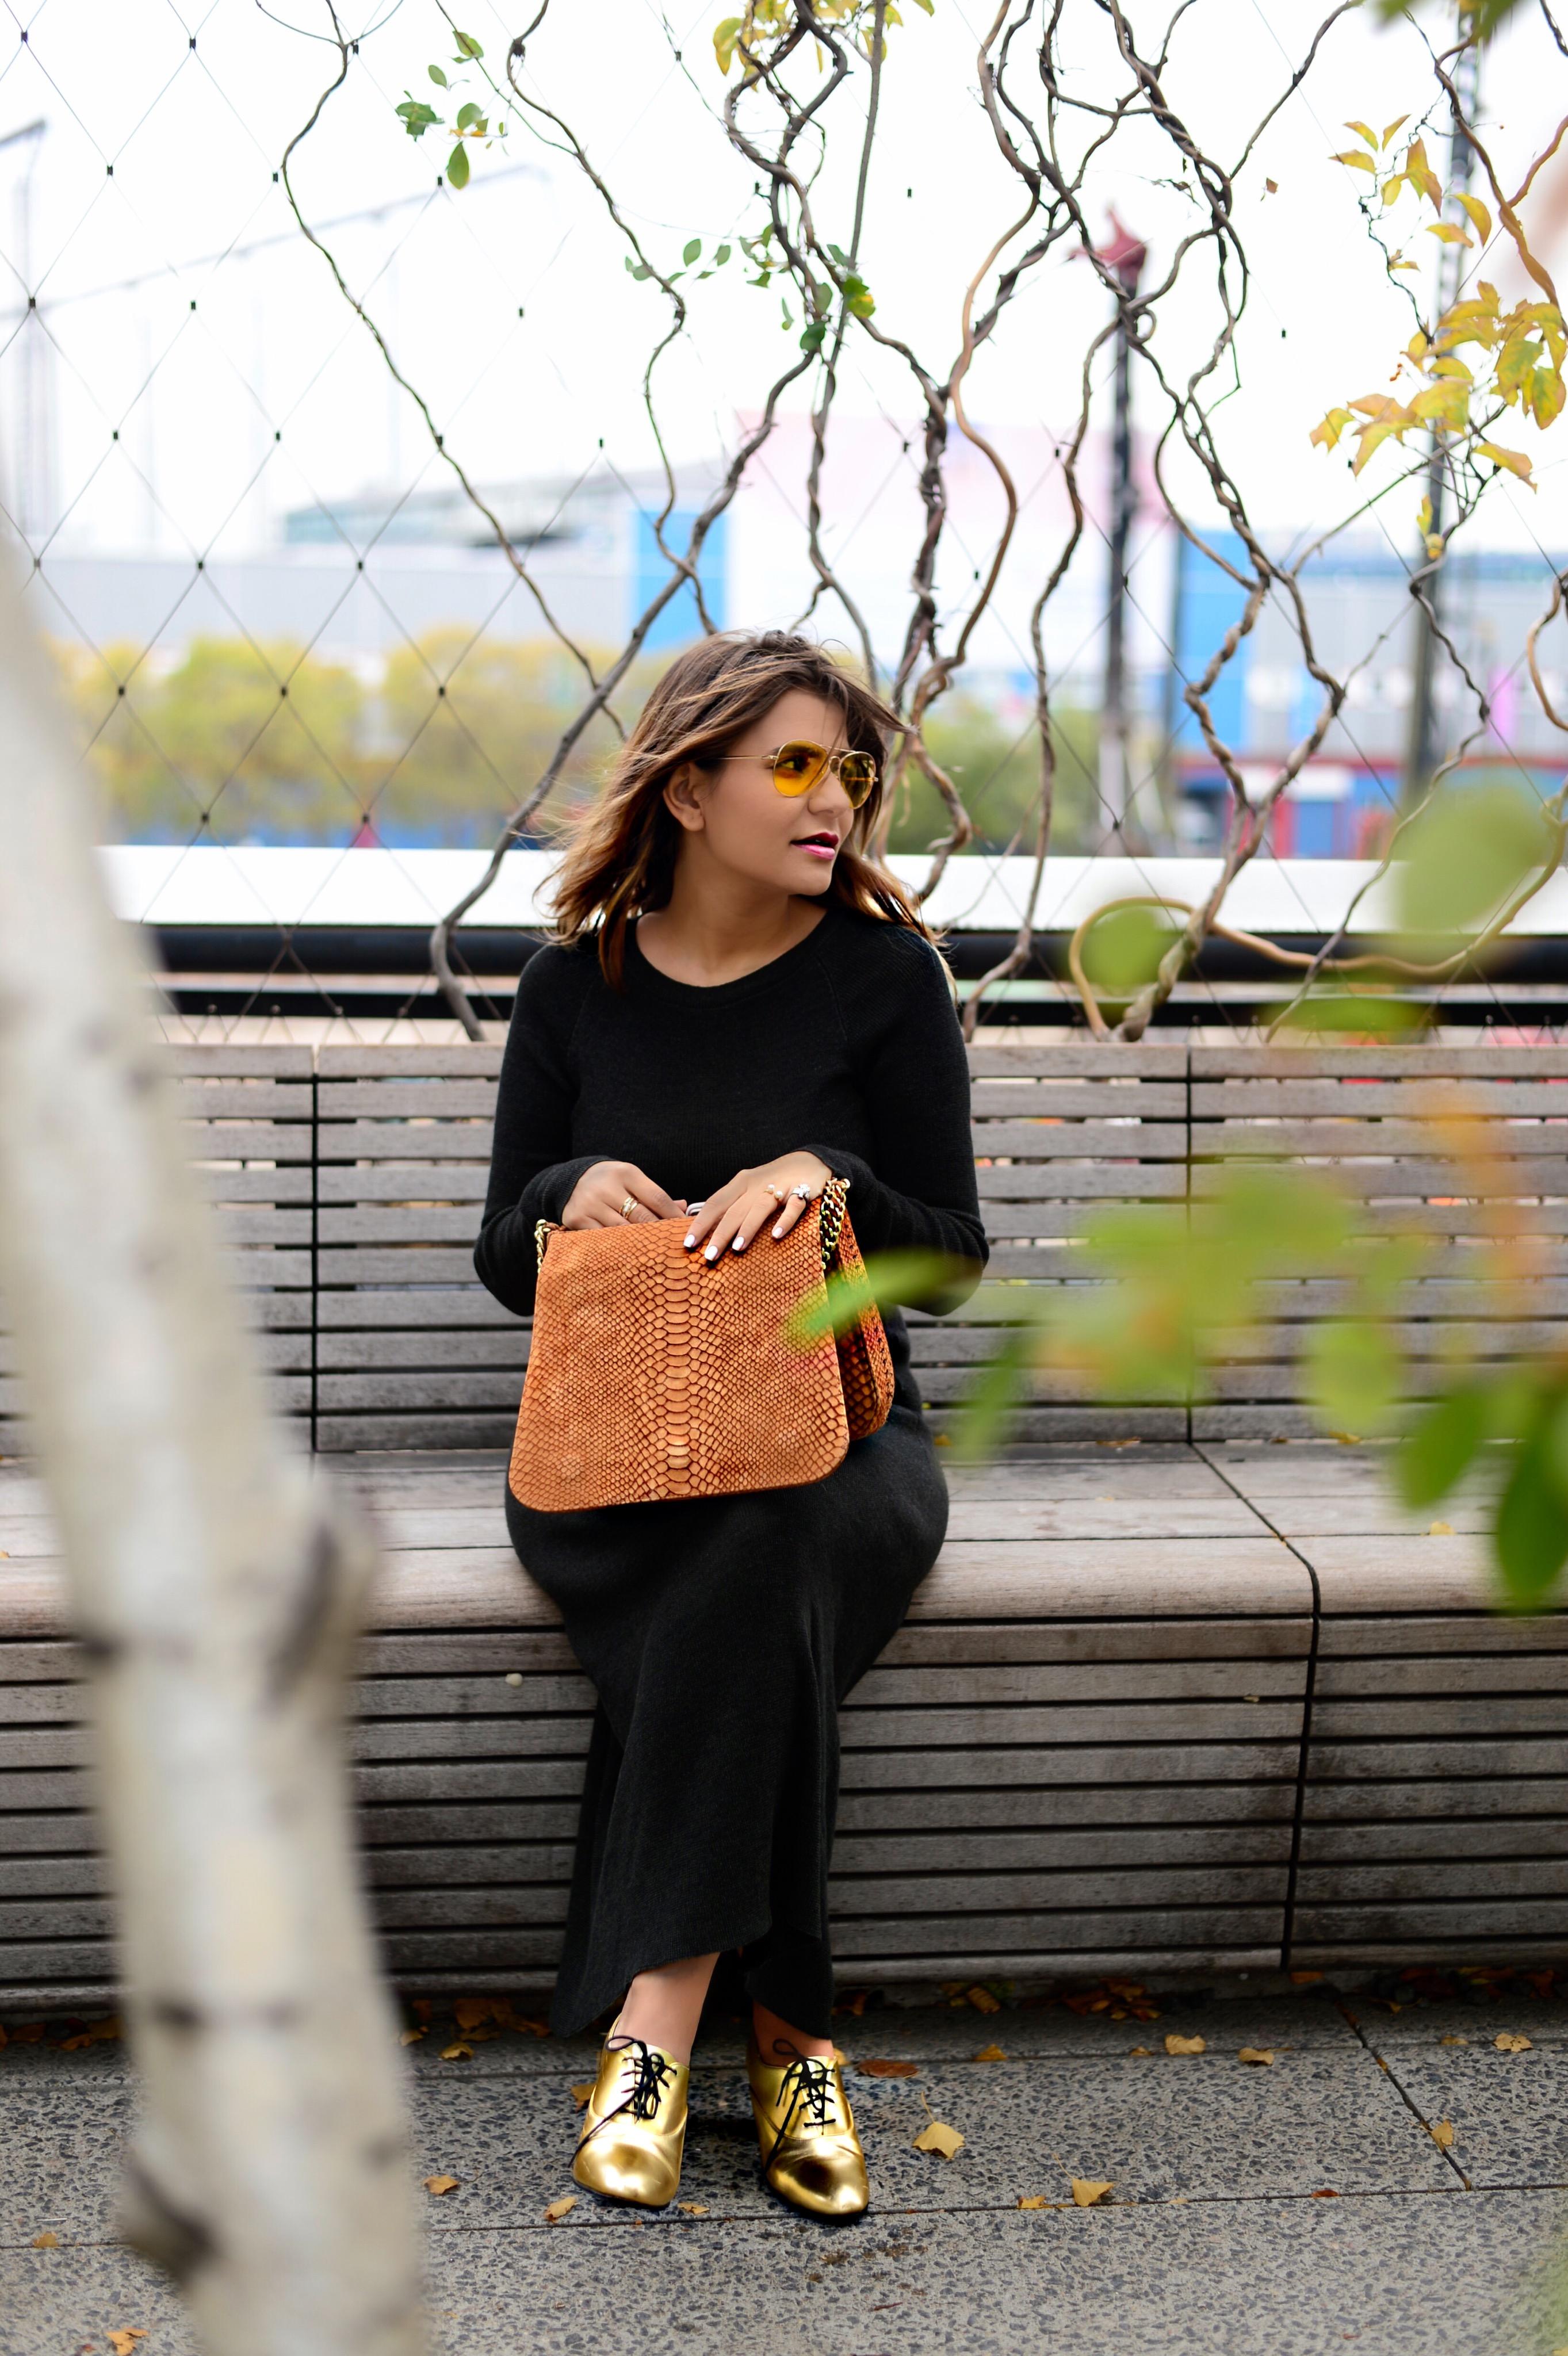 jersey-dress-gold-shoes-alley-girl-betul-yildiz-new-york-fashion-blogger-11